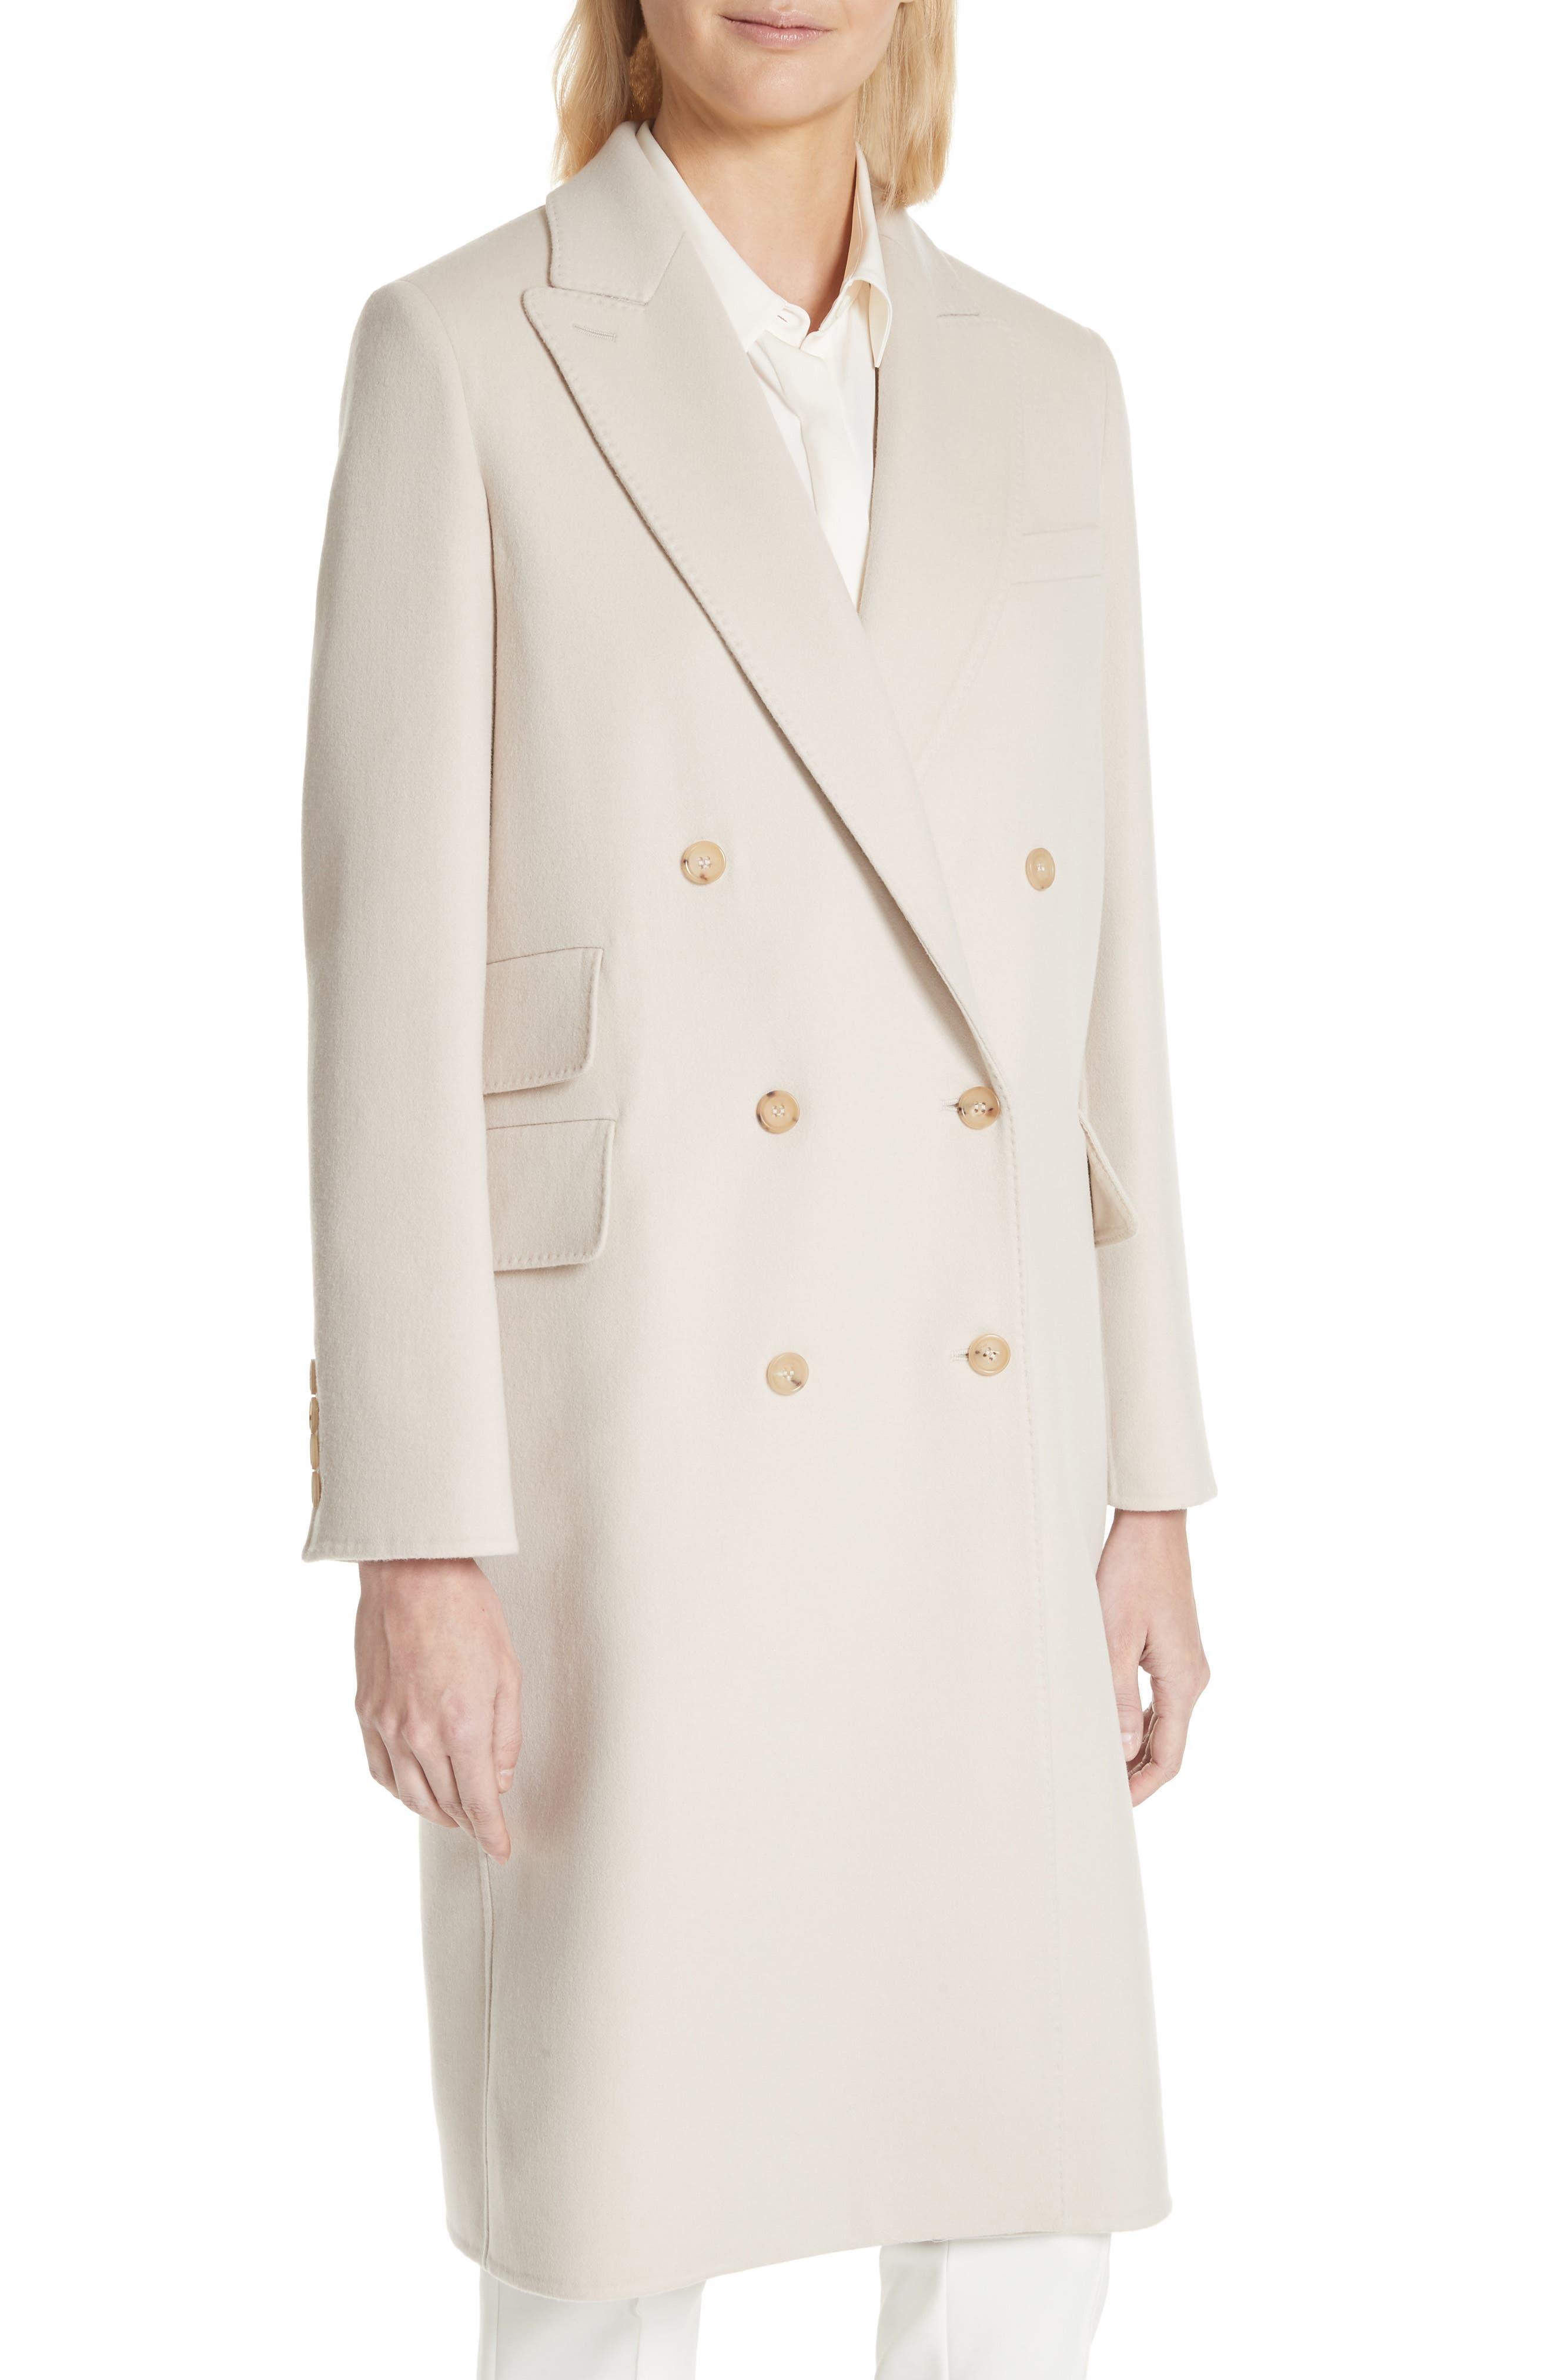 Armonia Wool & Cashmere Coat,                             Alternate thumbnail 4, color,                             906